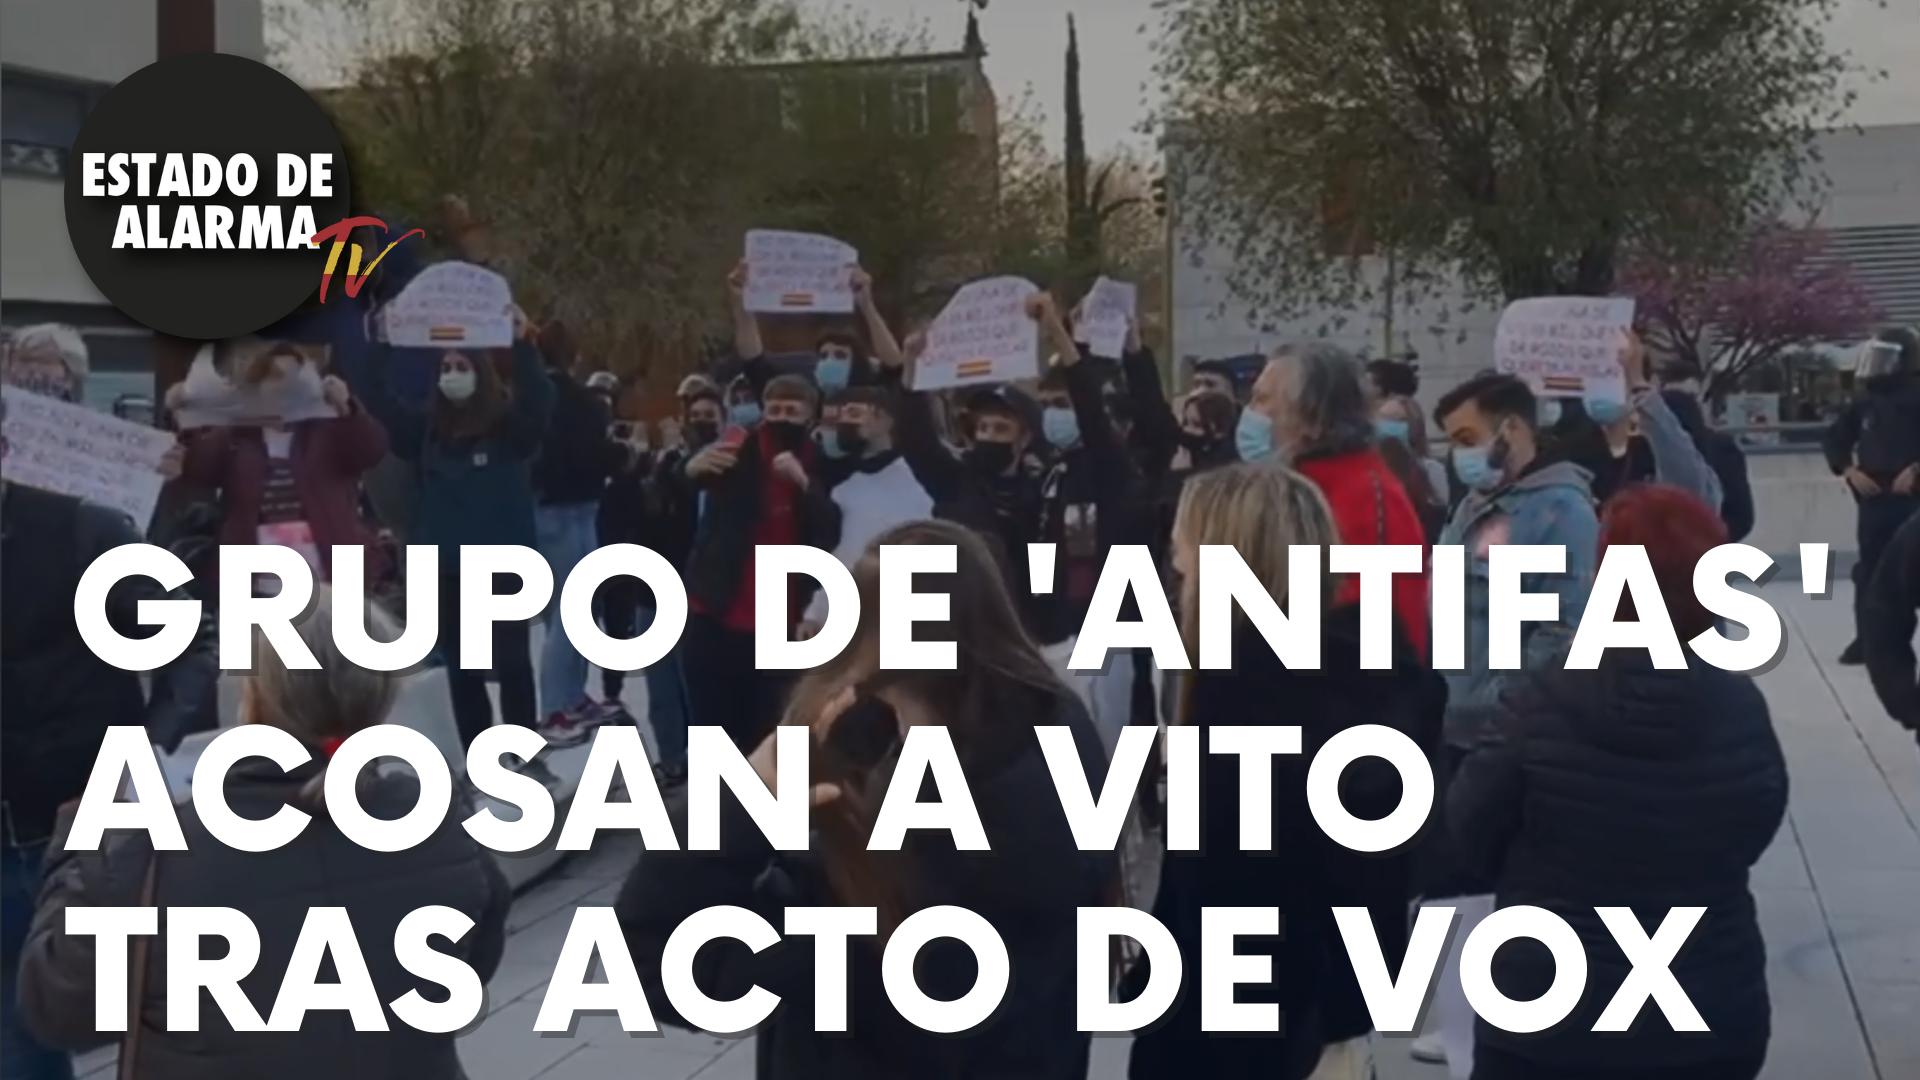 Un grupo de manifestantes de extrema izquierda acosan a Vito tras un acto de Vox